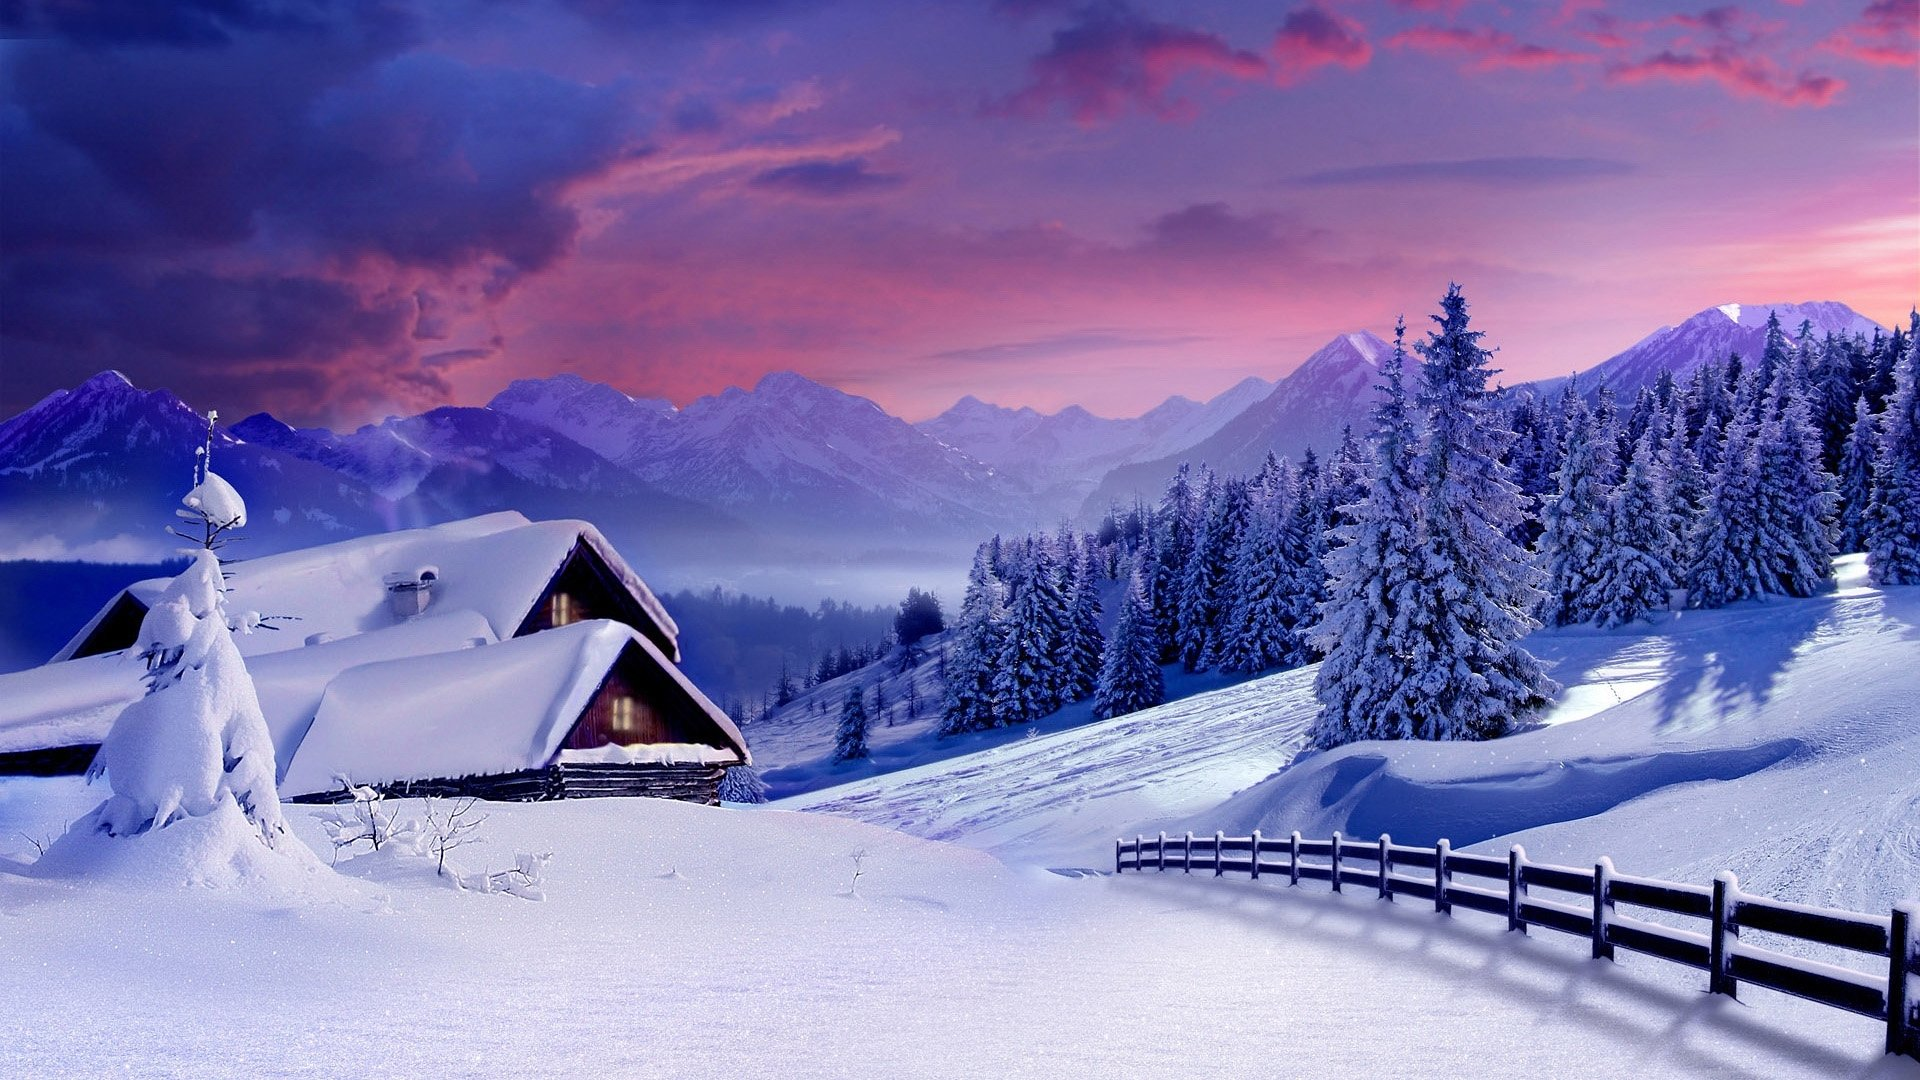 Winter Aesthetic Wallpaper Desktop